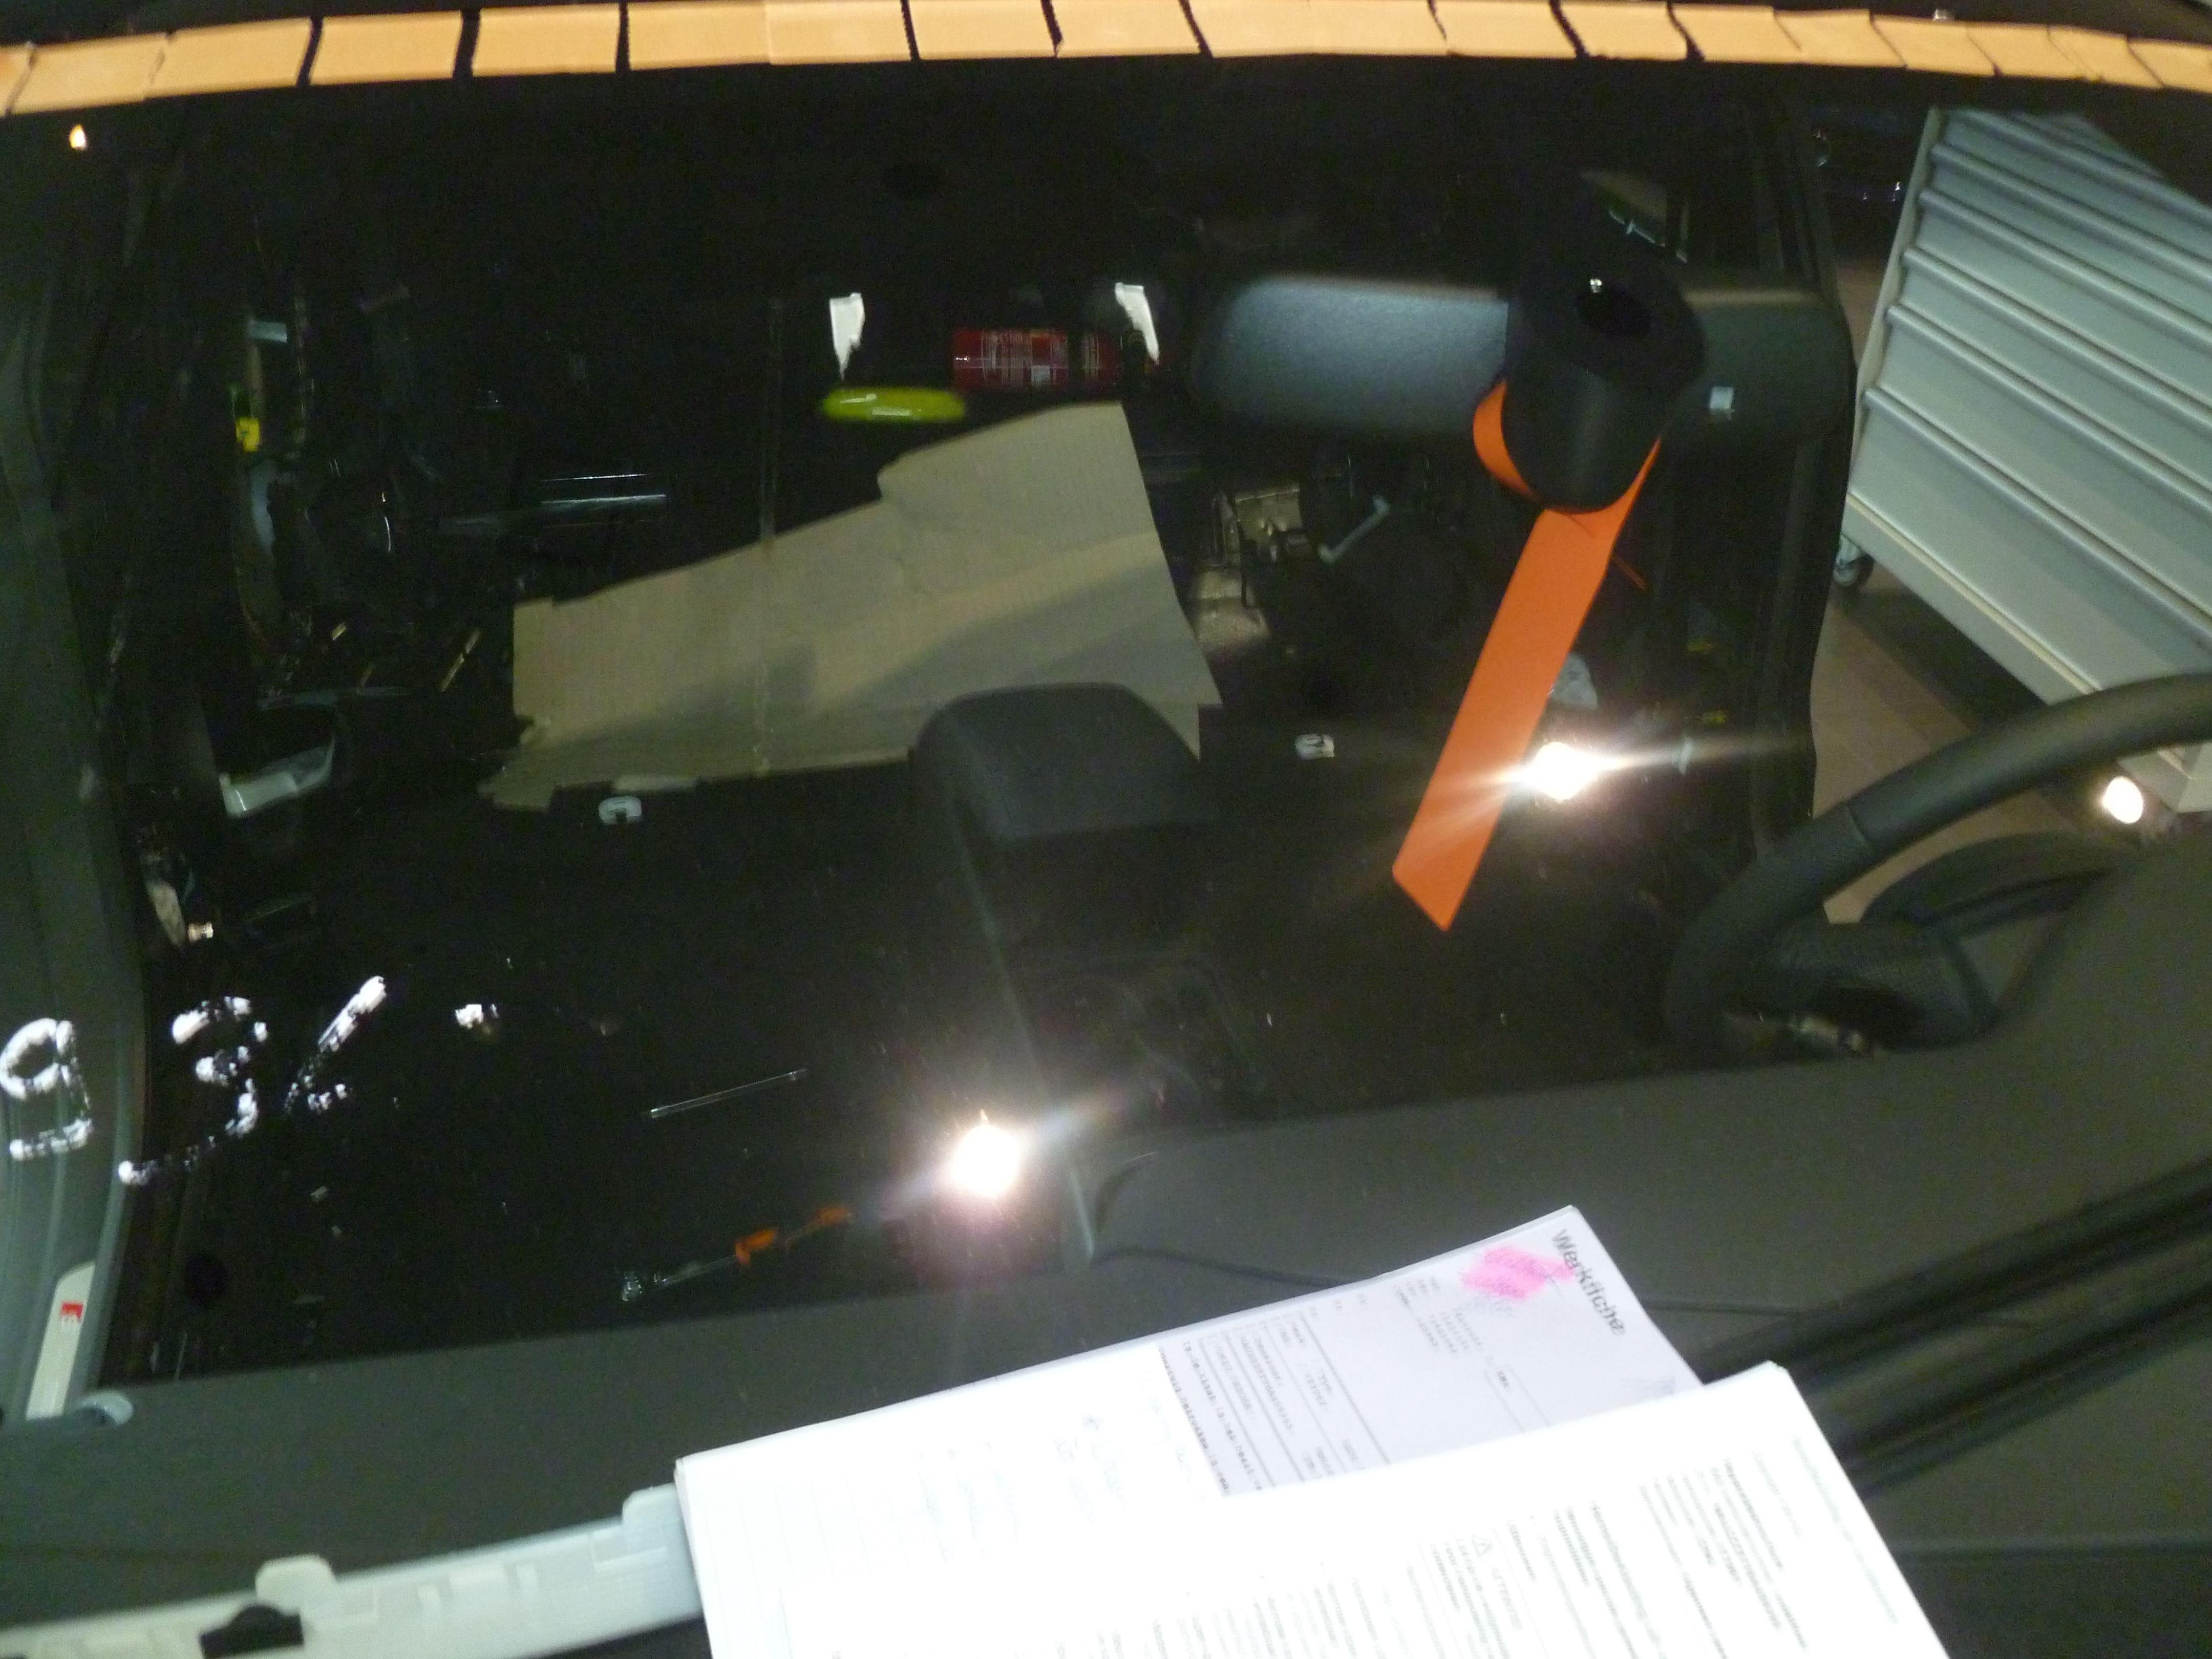 Audi A5 Coupe met Mat Zwarte Wrap, Carwrapping door Wrapmyride.nu Foto-nr:4631, ©2021